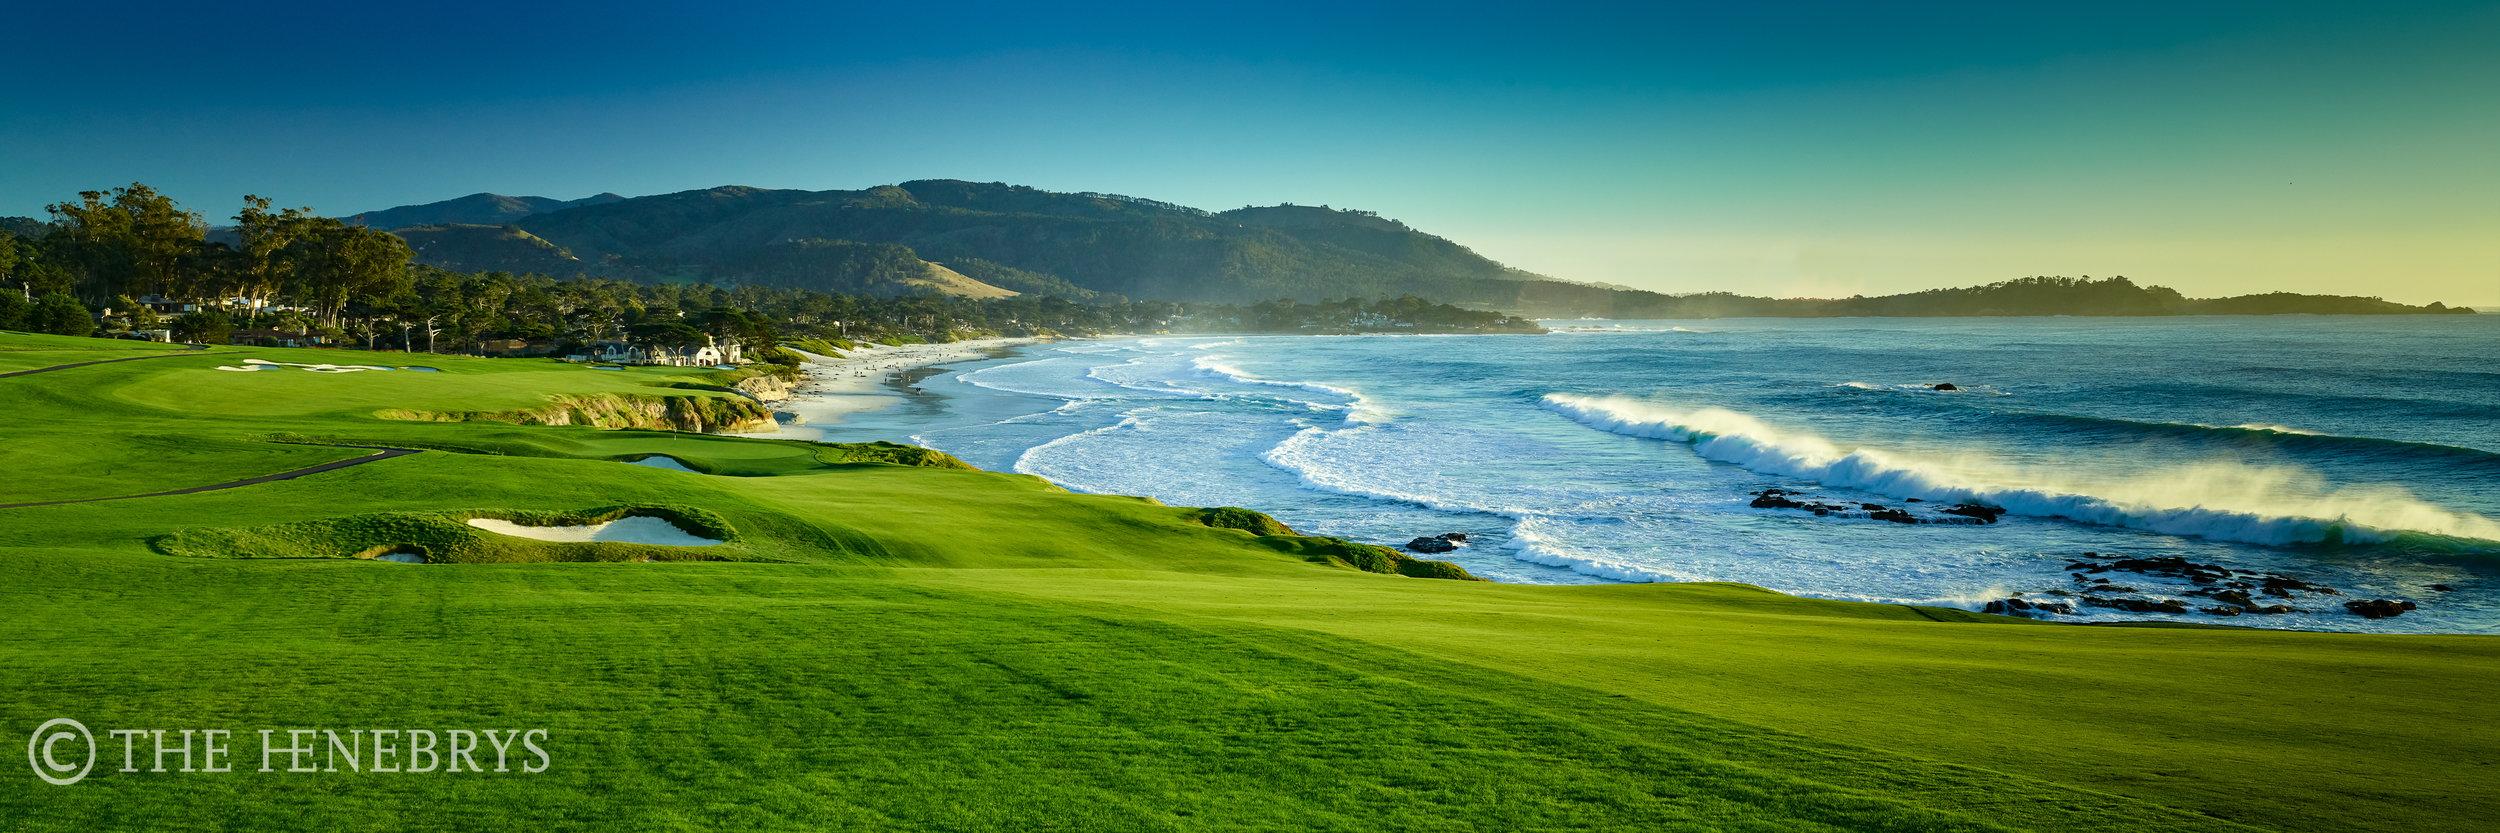 "Pebble Beach Golf Links® #09 ""Perfect Set"", Pebble Beach, California"